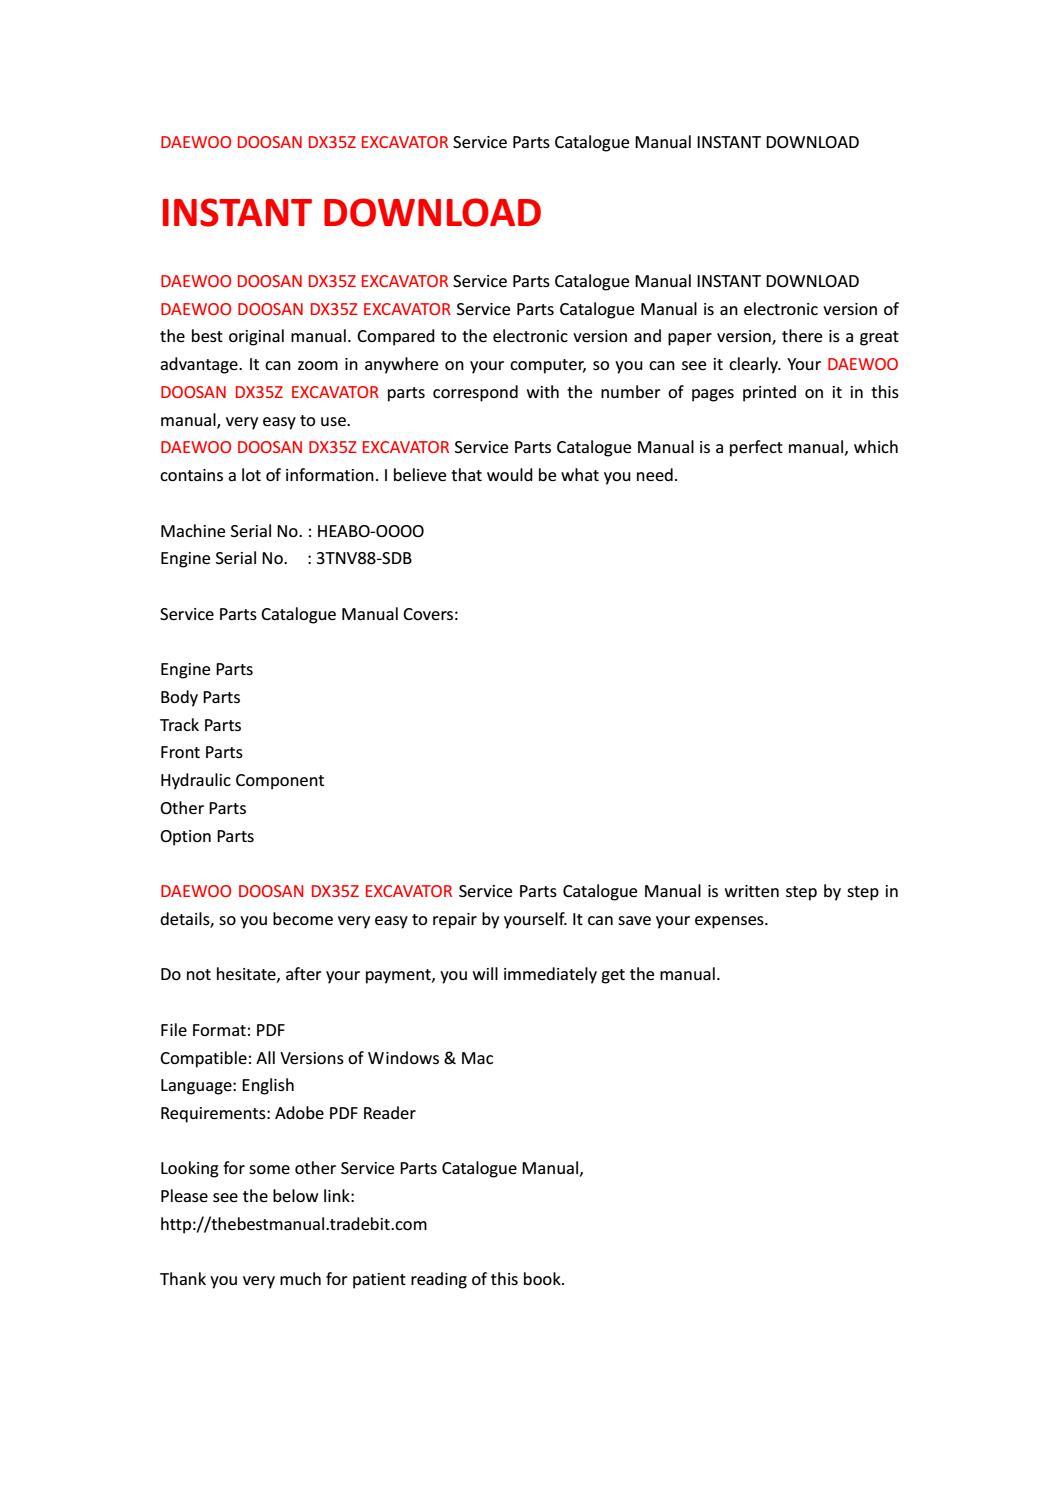 Daewoo doosan dx35z excavator service parts catalogue manual instant  download by kjjsefhsjef - issuu